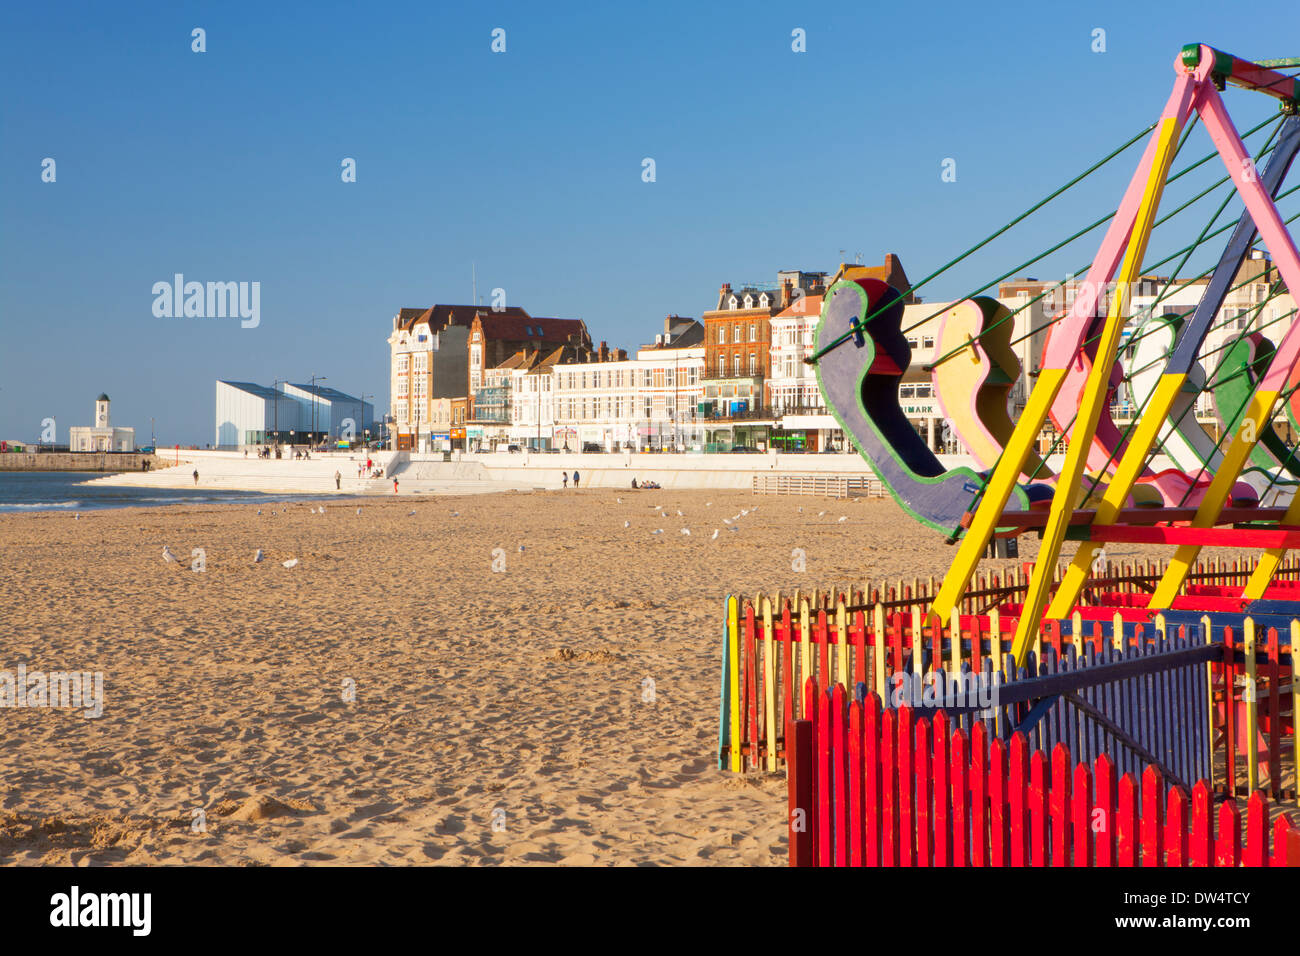 Swings on Margate beach, Margate, Kent, England - Stock Image